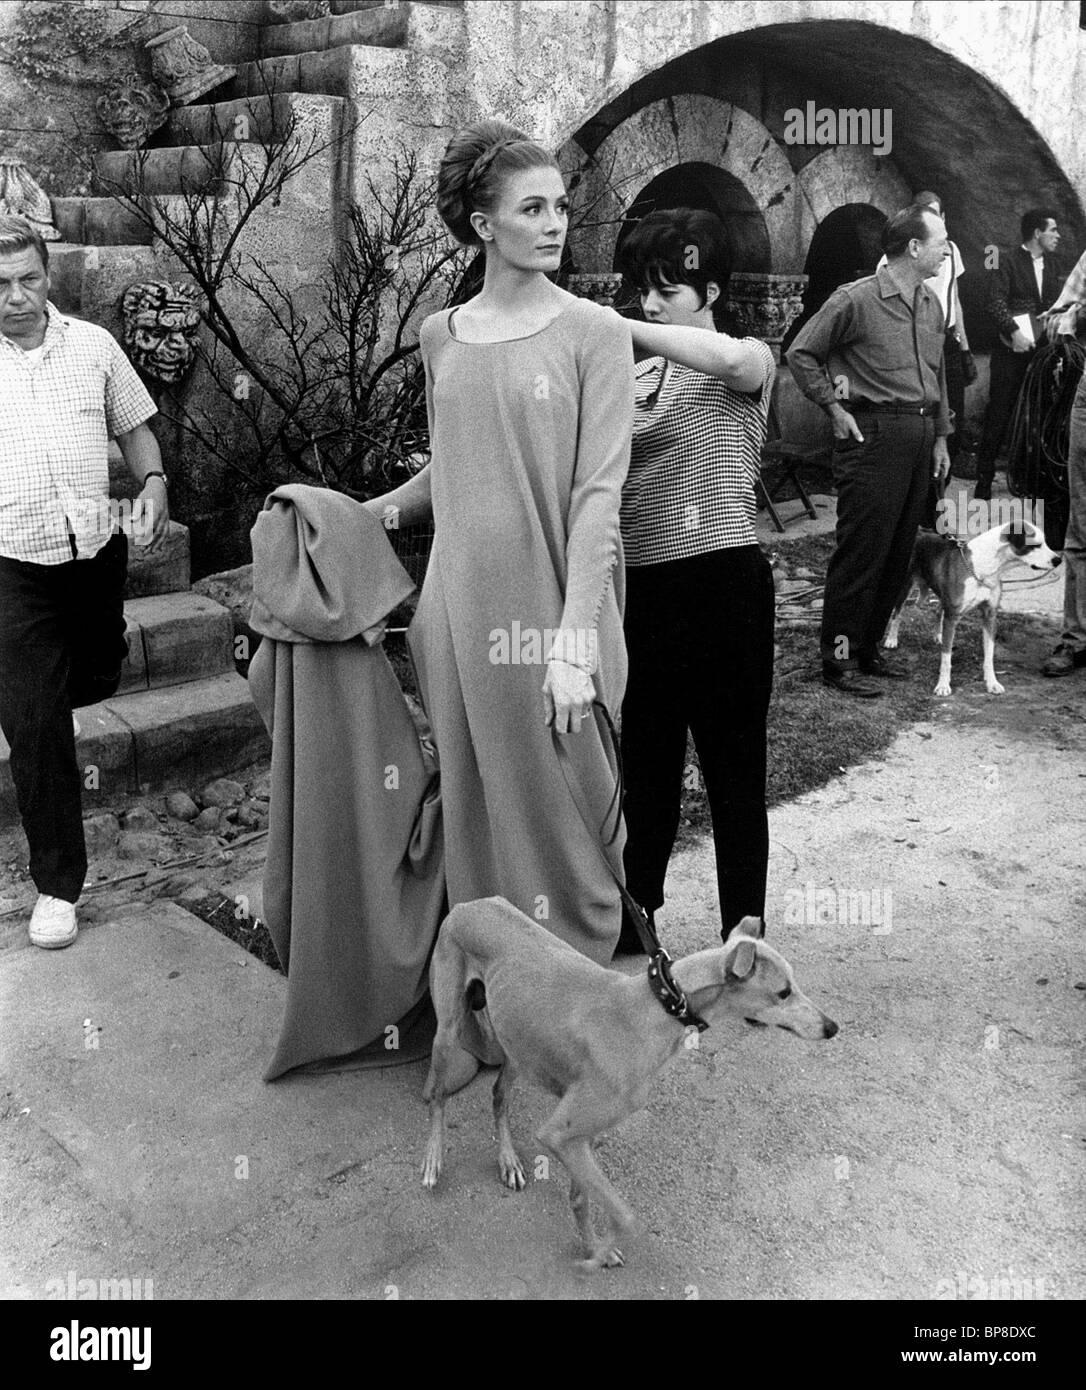 vanessa redgrave amp dog camelot 1967 stock photo royalty